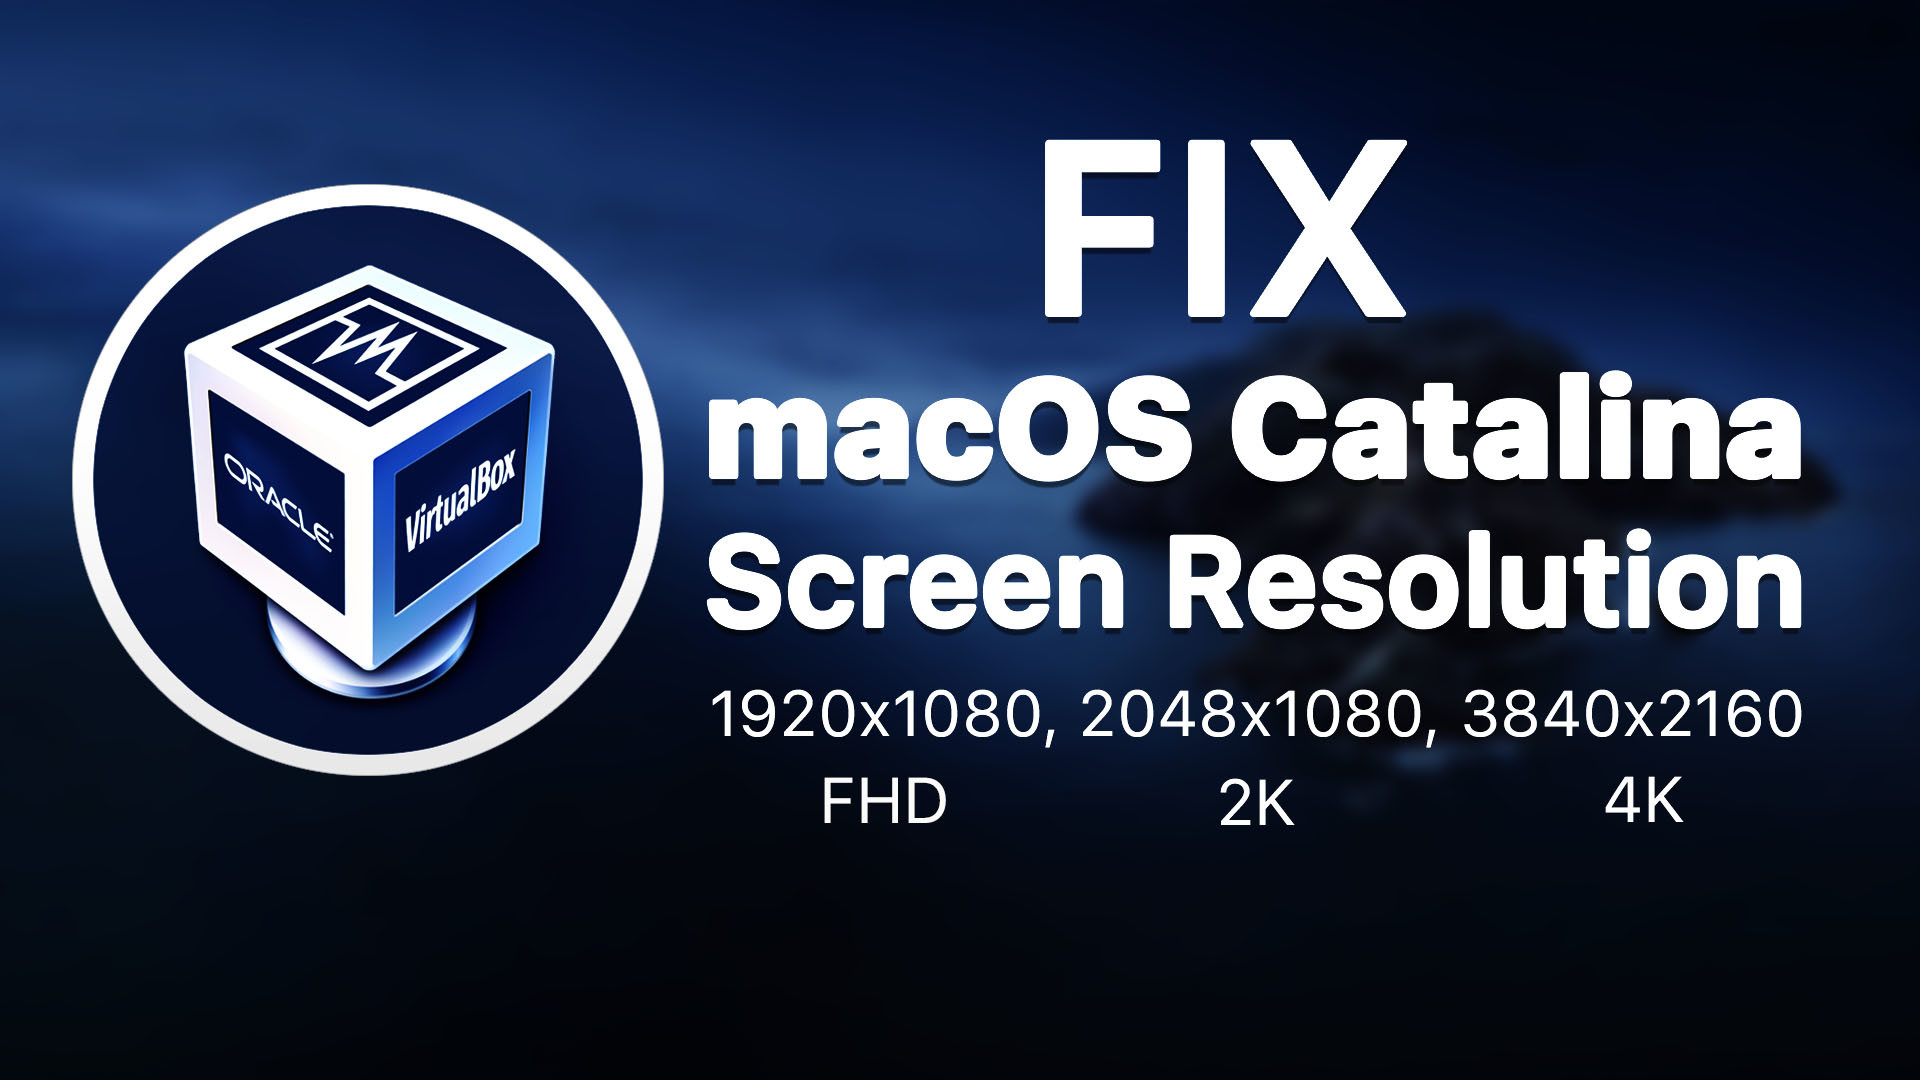 Fix Macos Catalina Screen Resolution On Virtualbox Wikigain